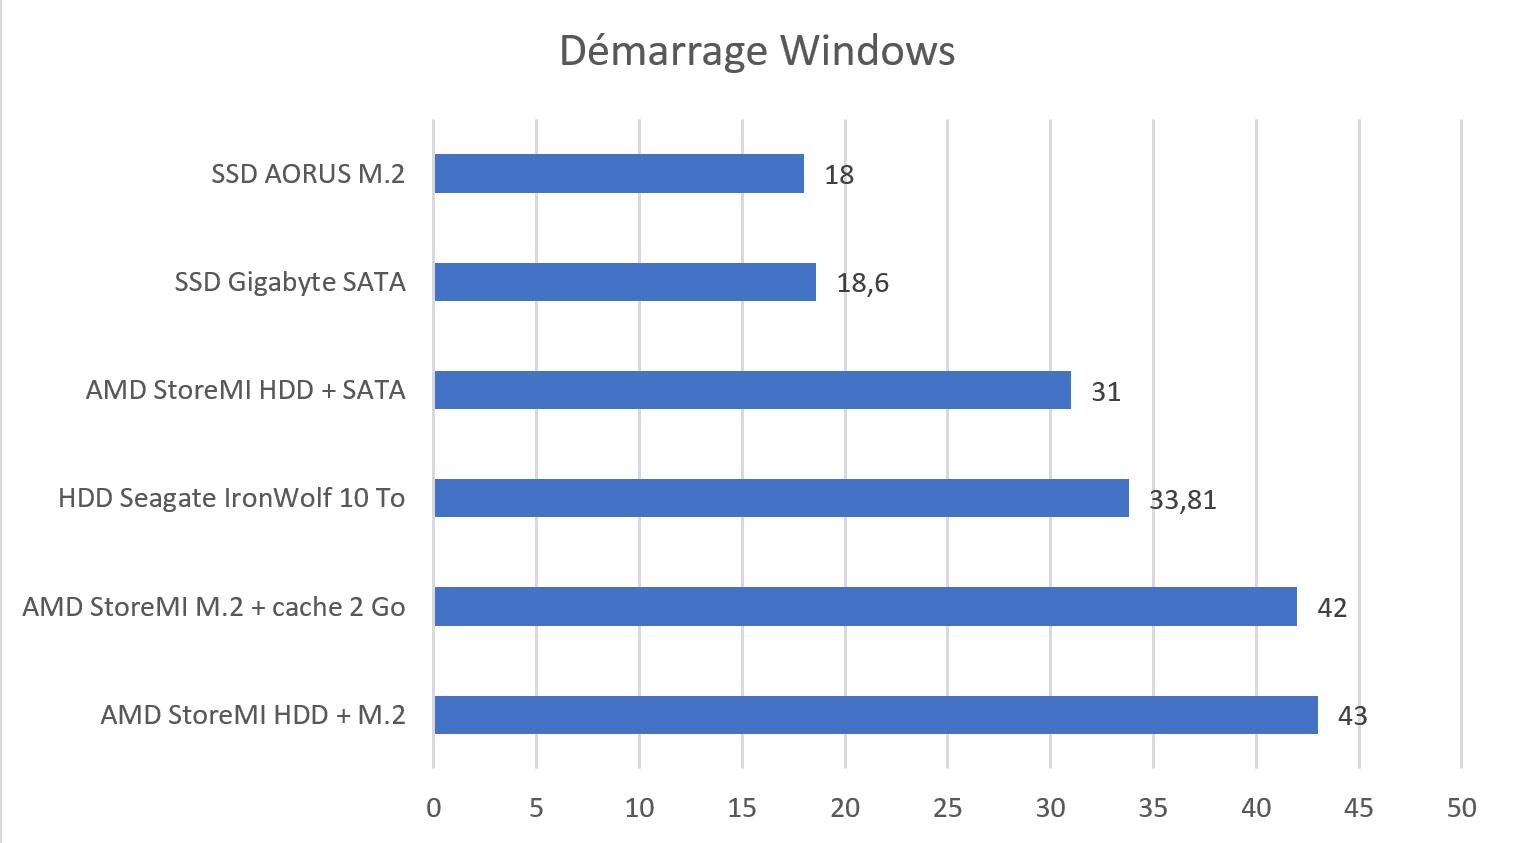 Test AMD StoreMI démarrage windows